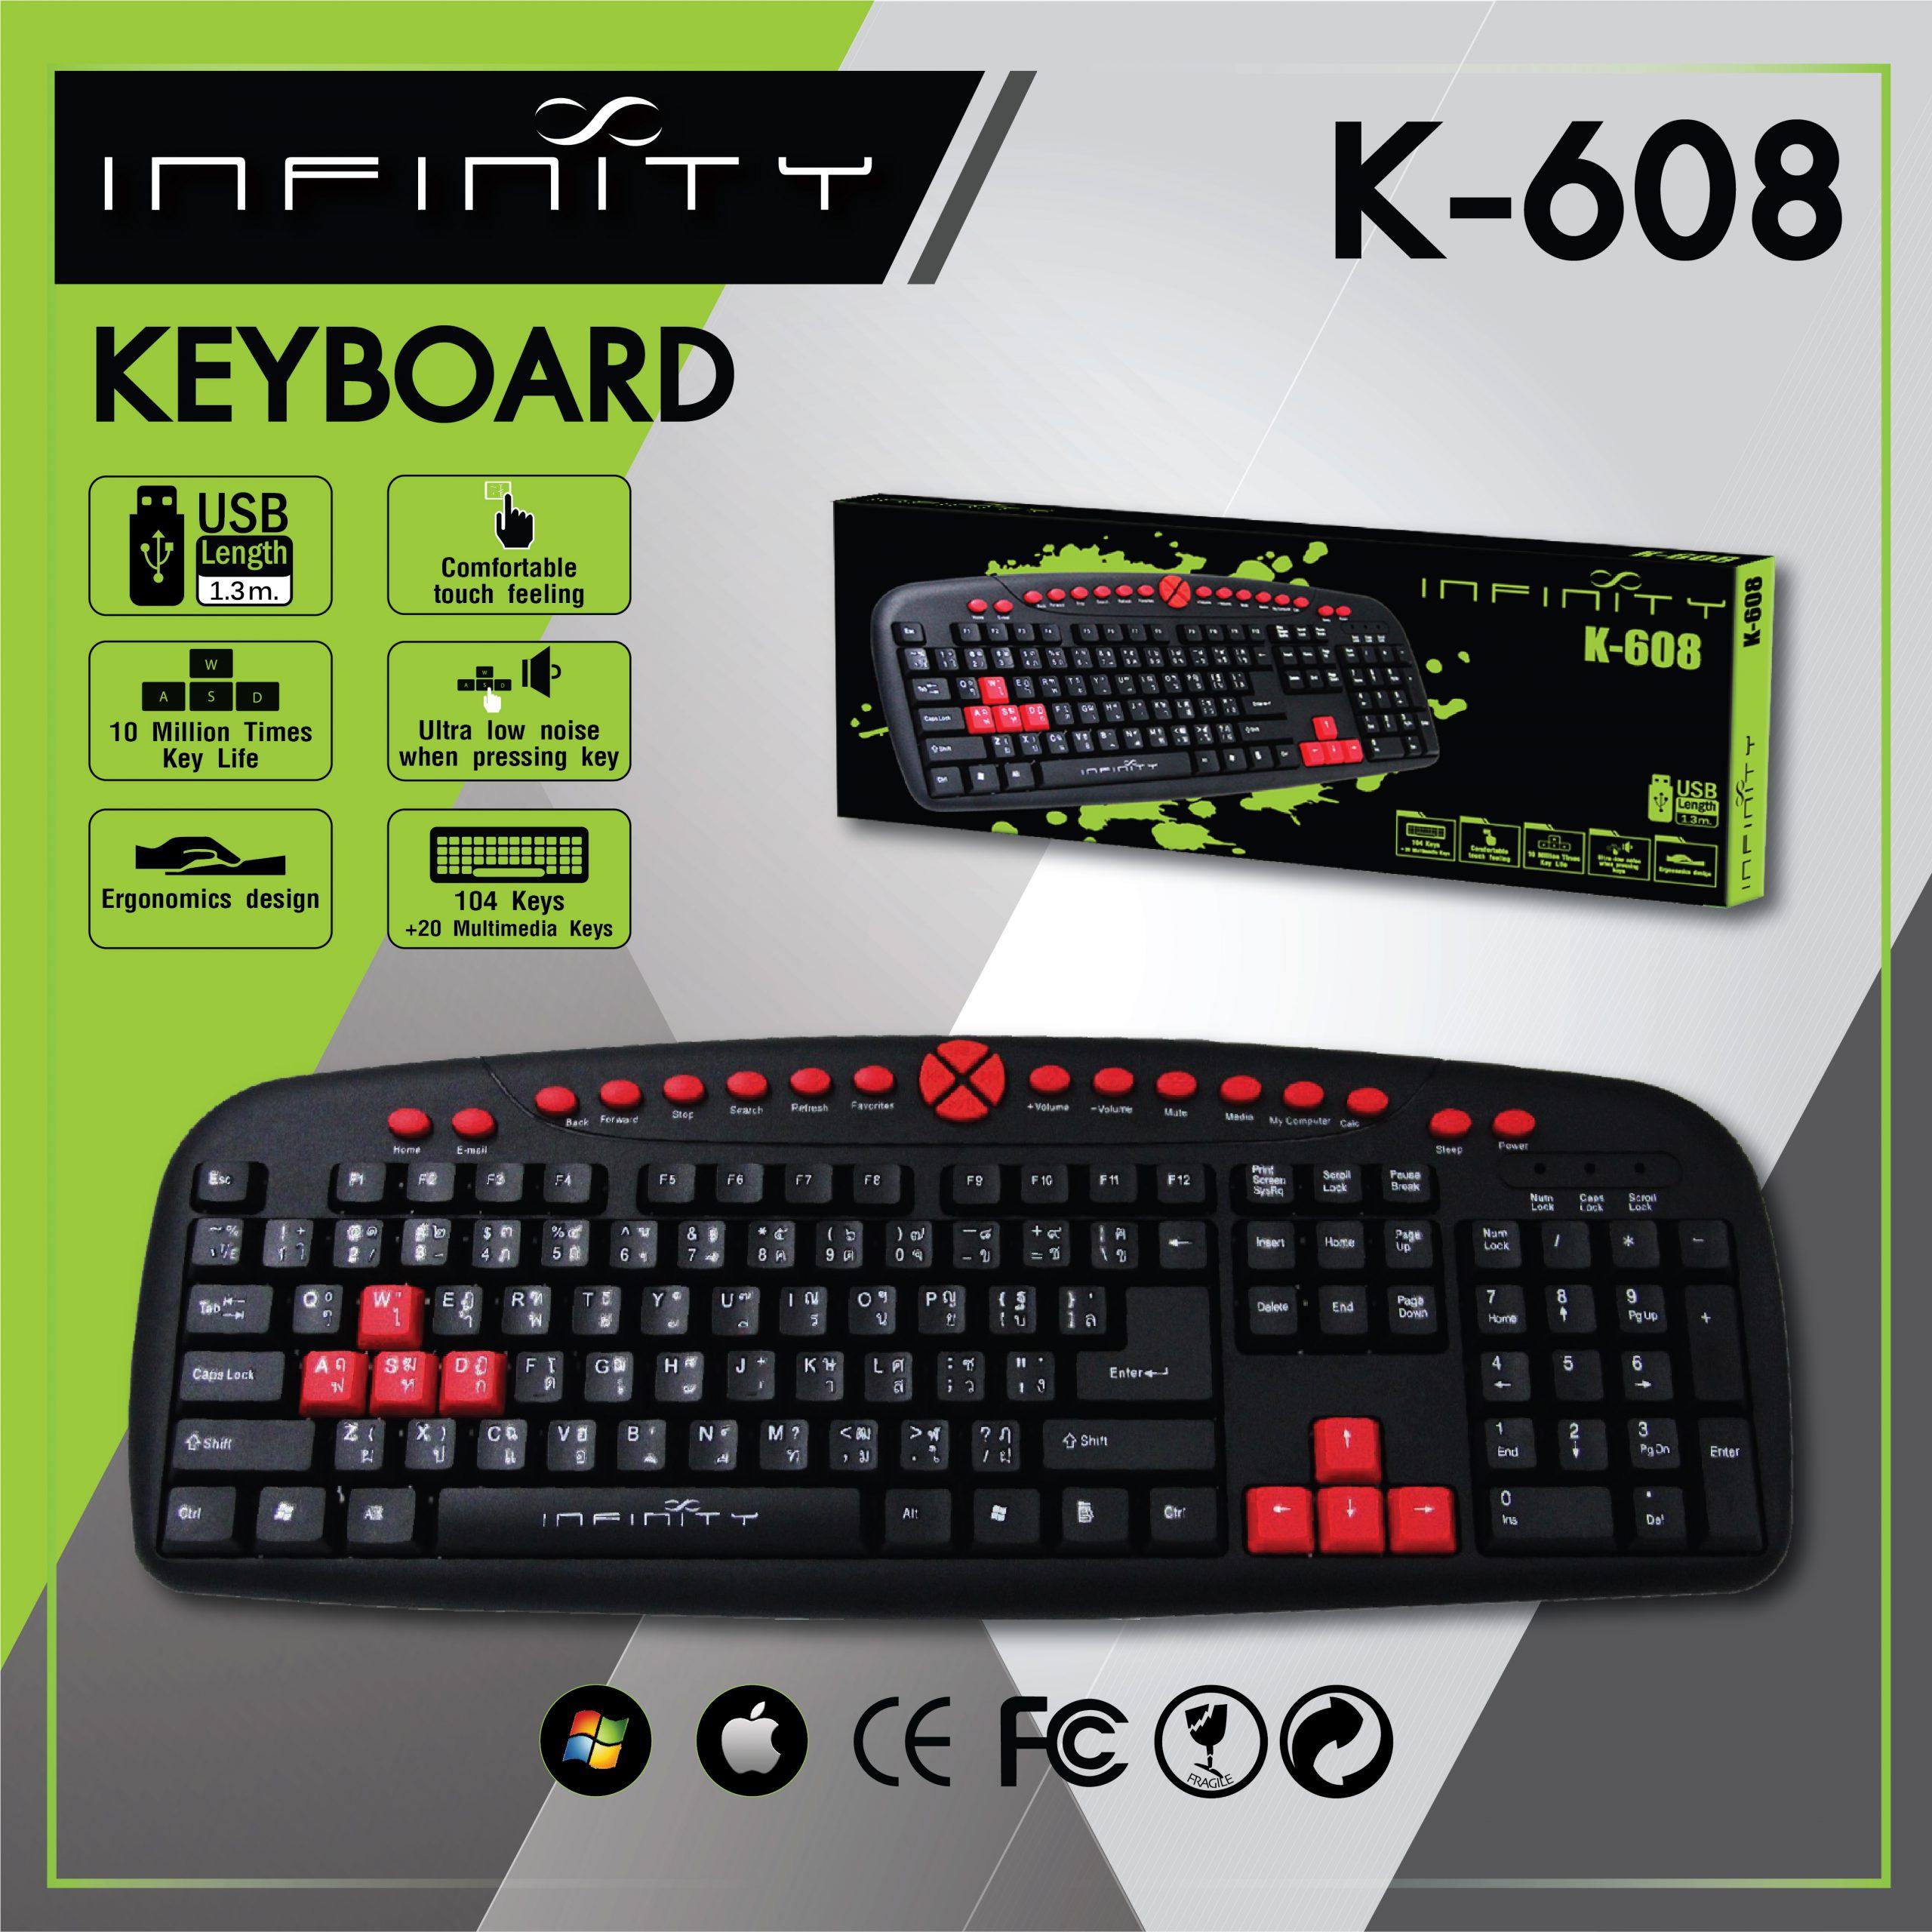 K-608